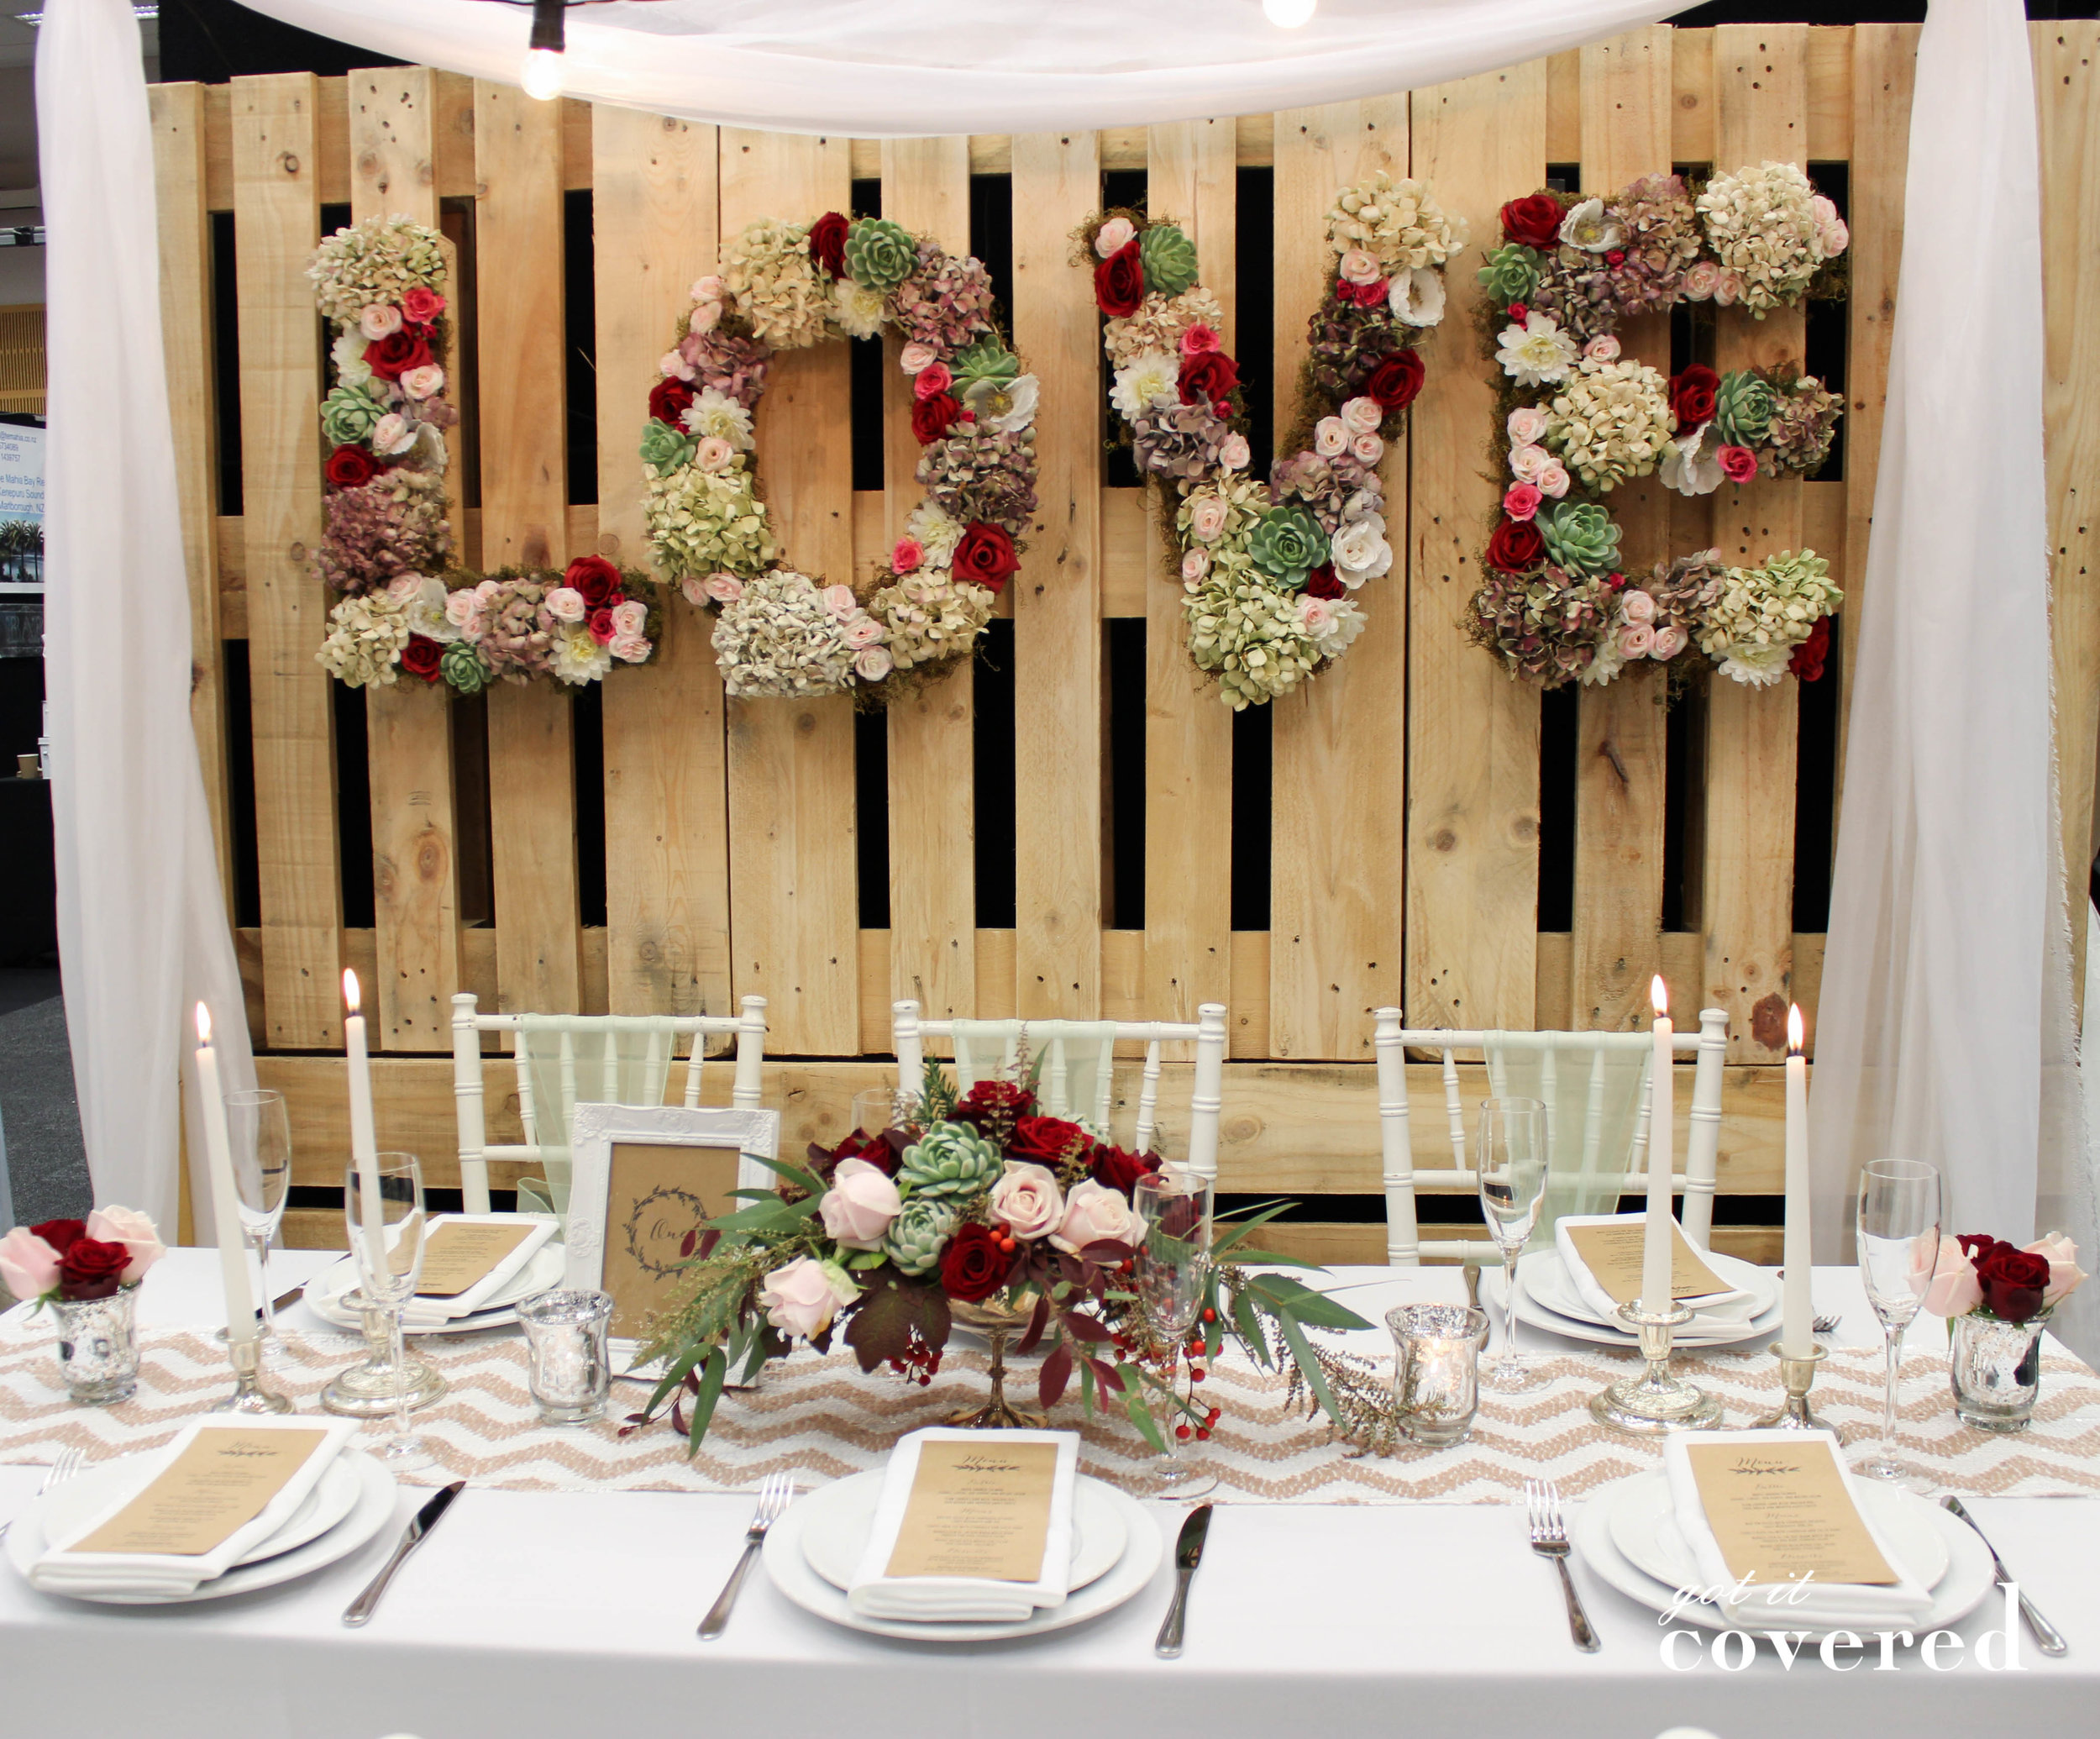 hBlenheim wedding show 2015-39.jpg